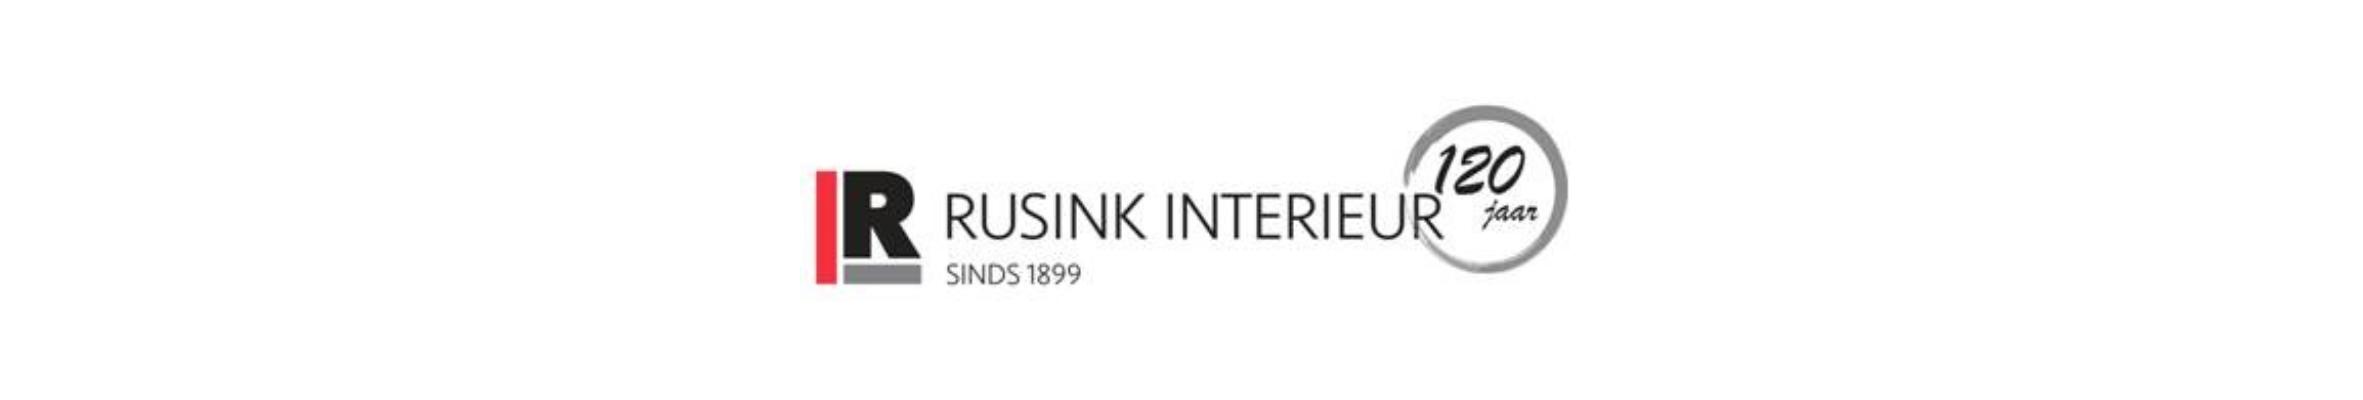 Langwerpig logo van Rusink Interieur